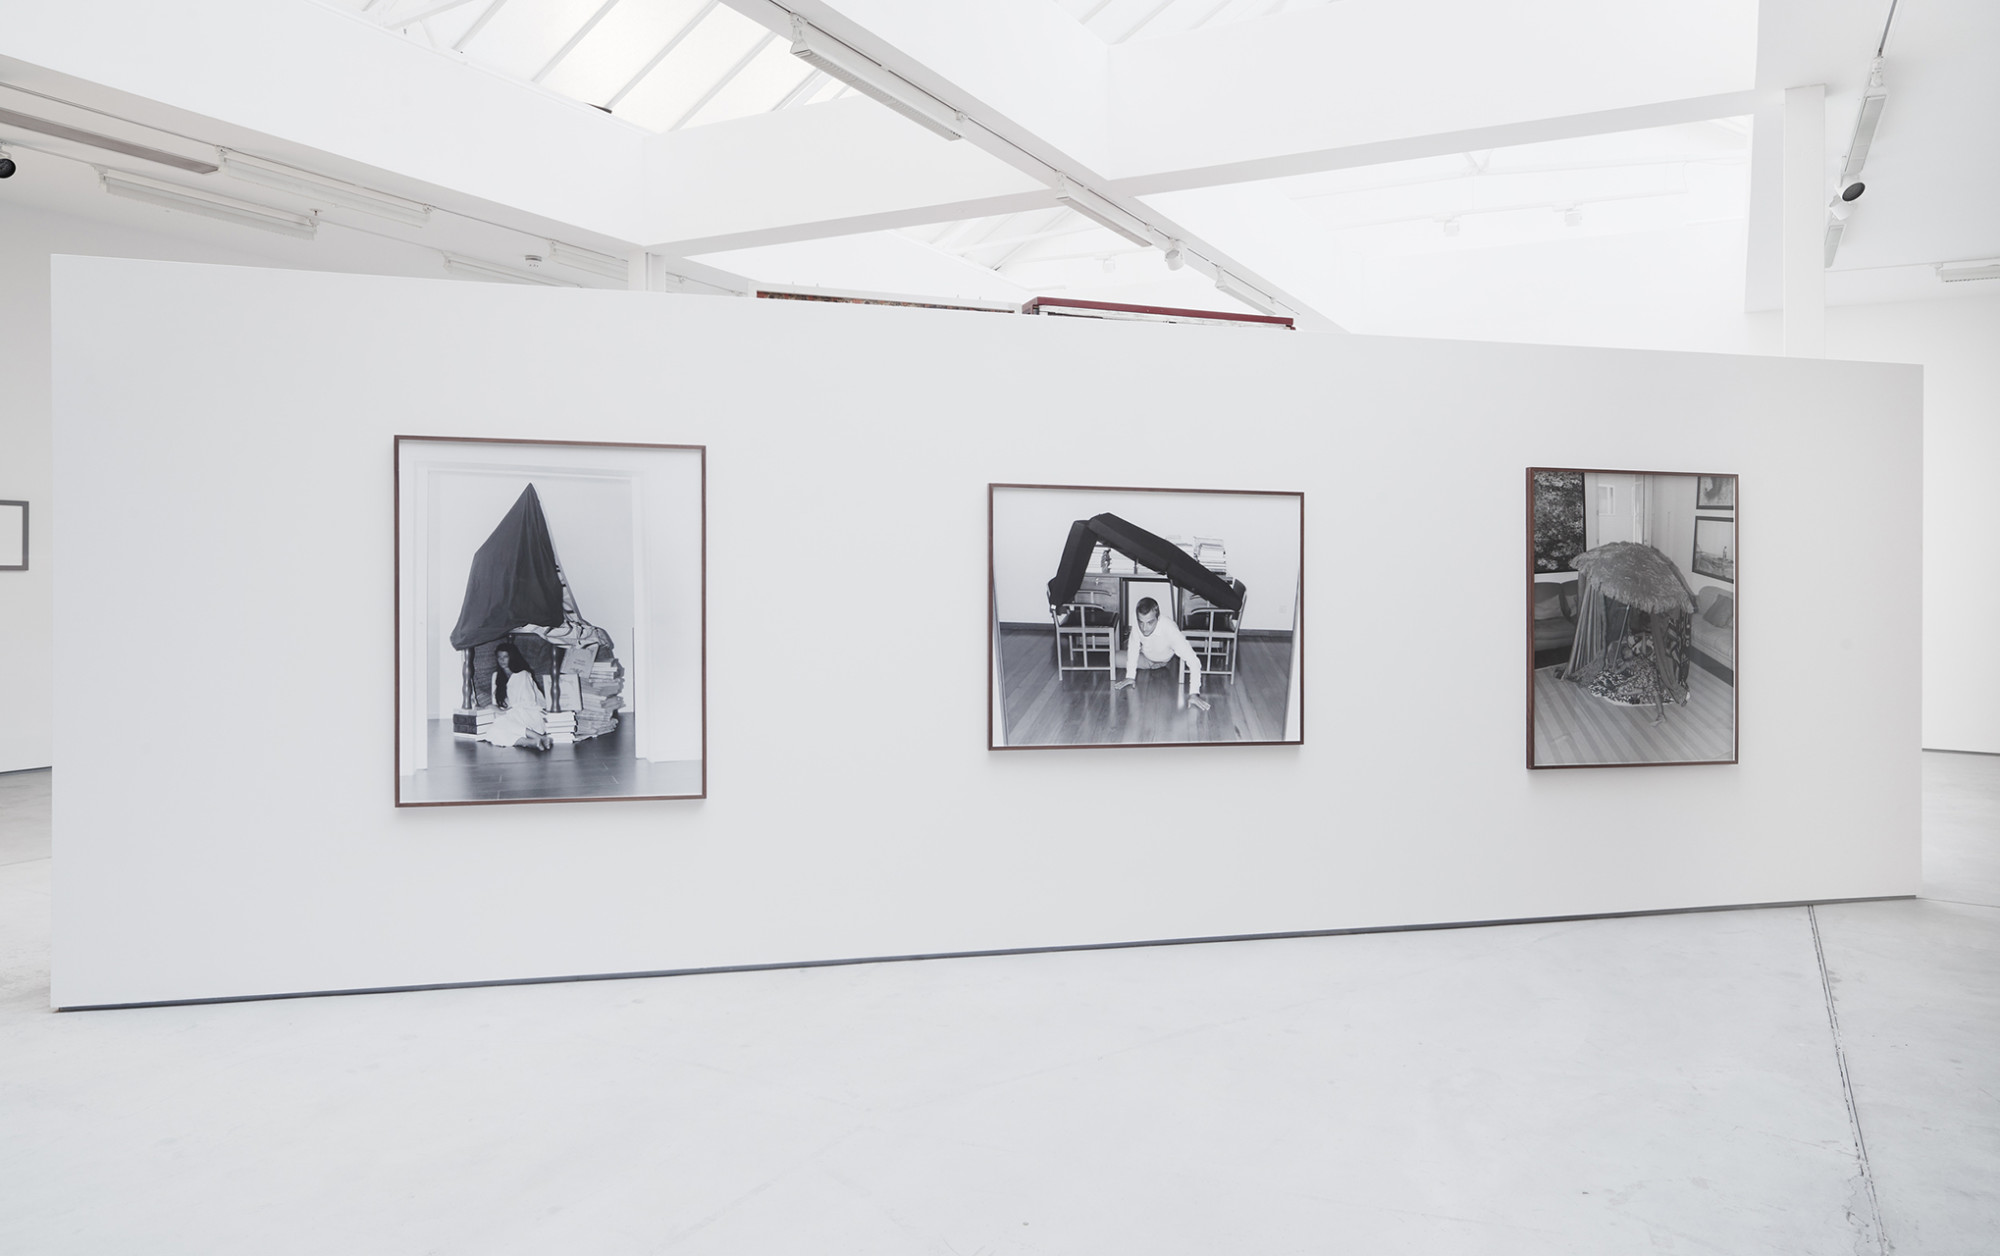 <p>Joanna Piotrowska, installation view, 2017</p>